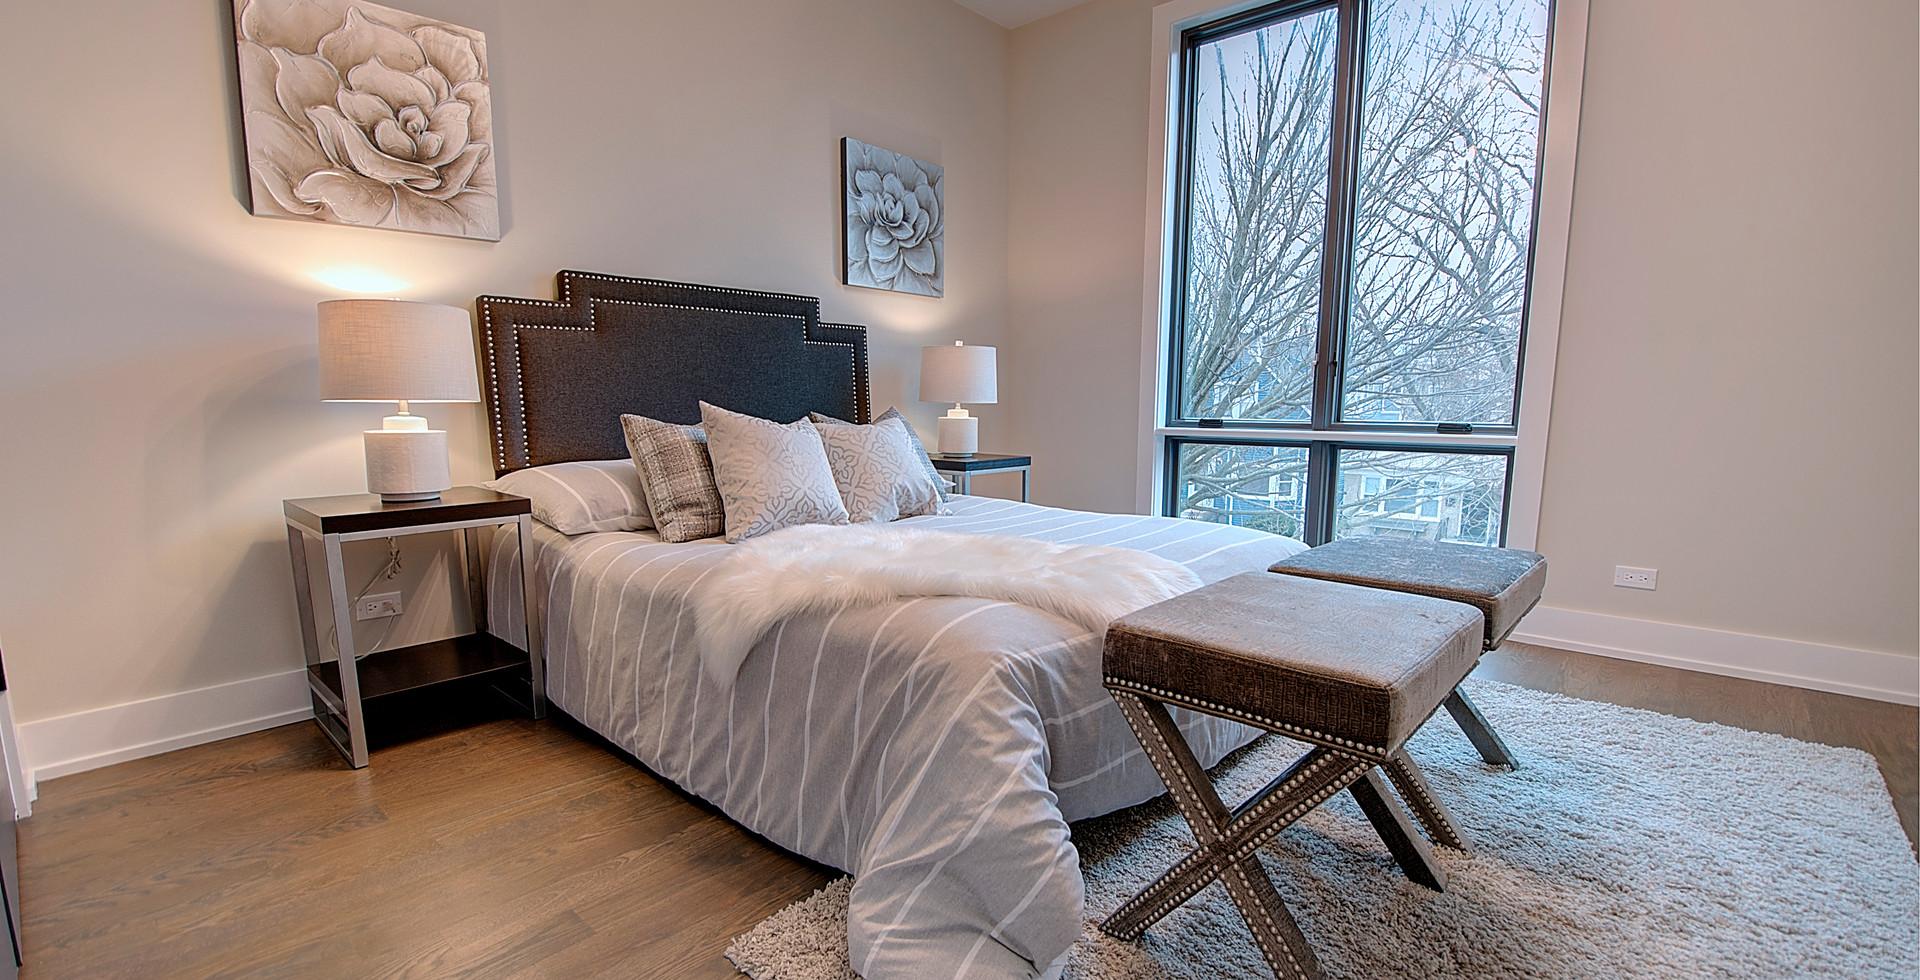 Bedroom in Burr Ridge designed by MRM Home Design.jpg